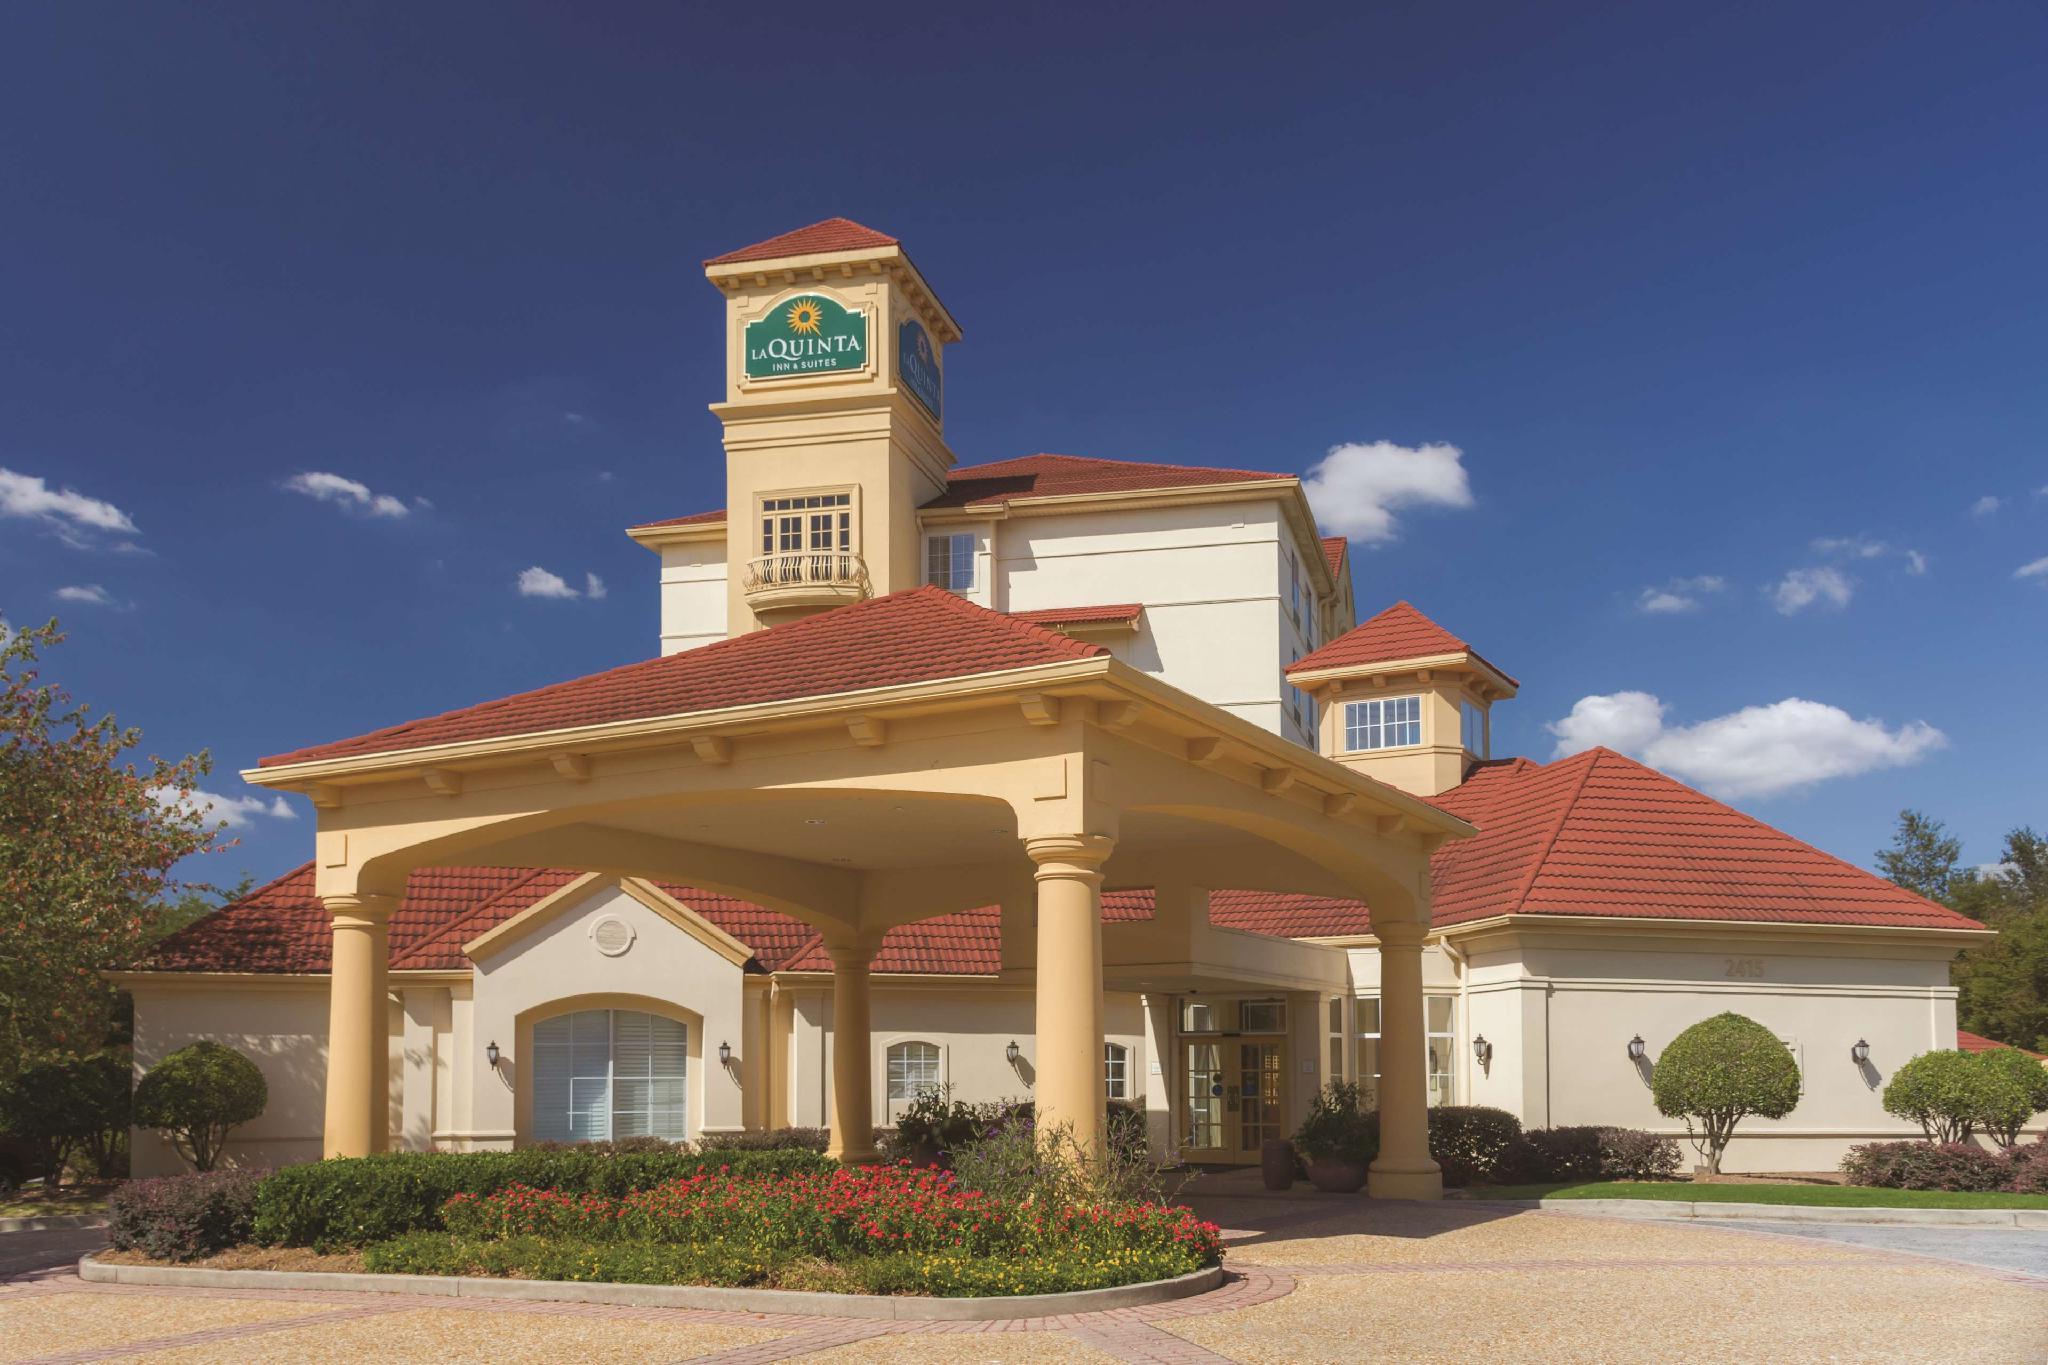 La Quinta Inn And Suites By Wyndham Atlanta Ballpark Galleria